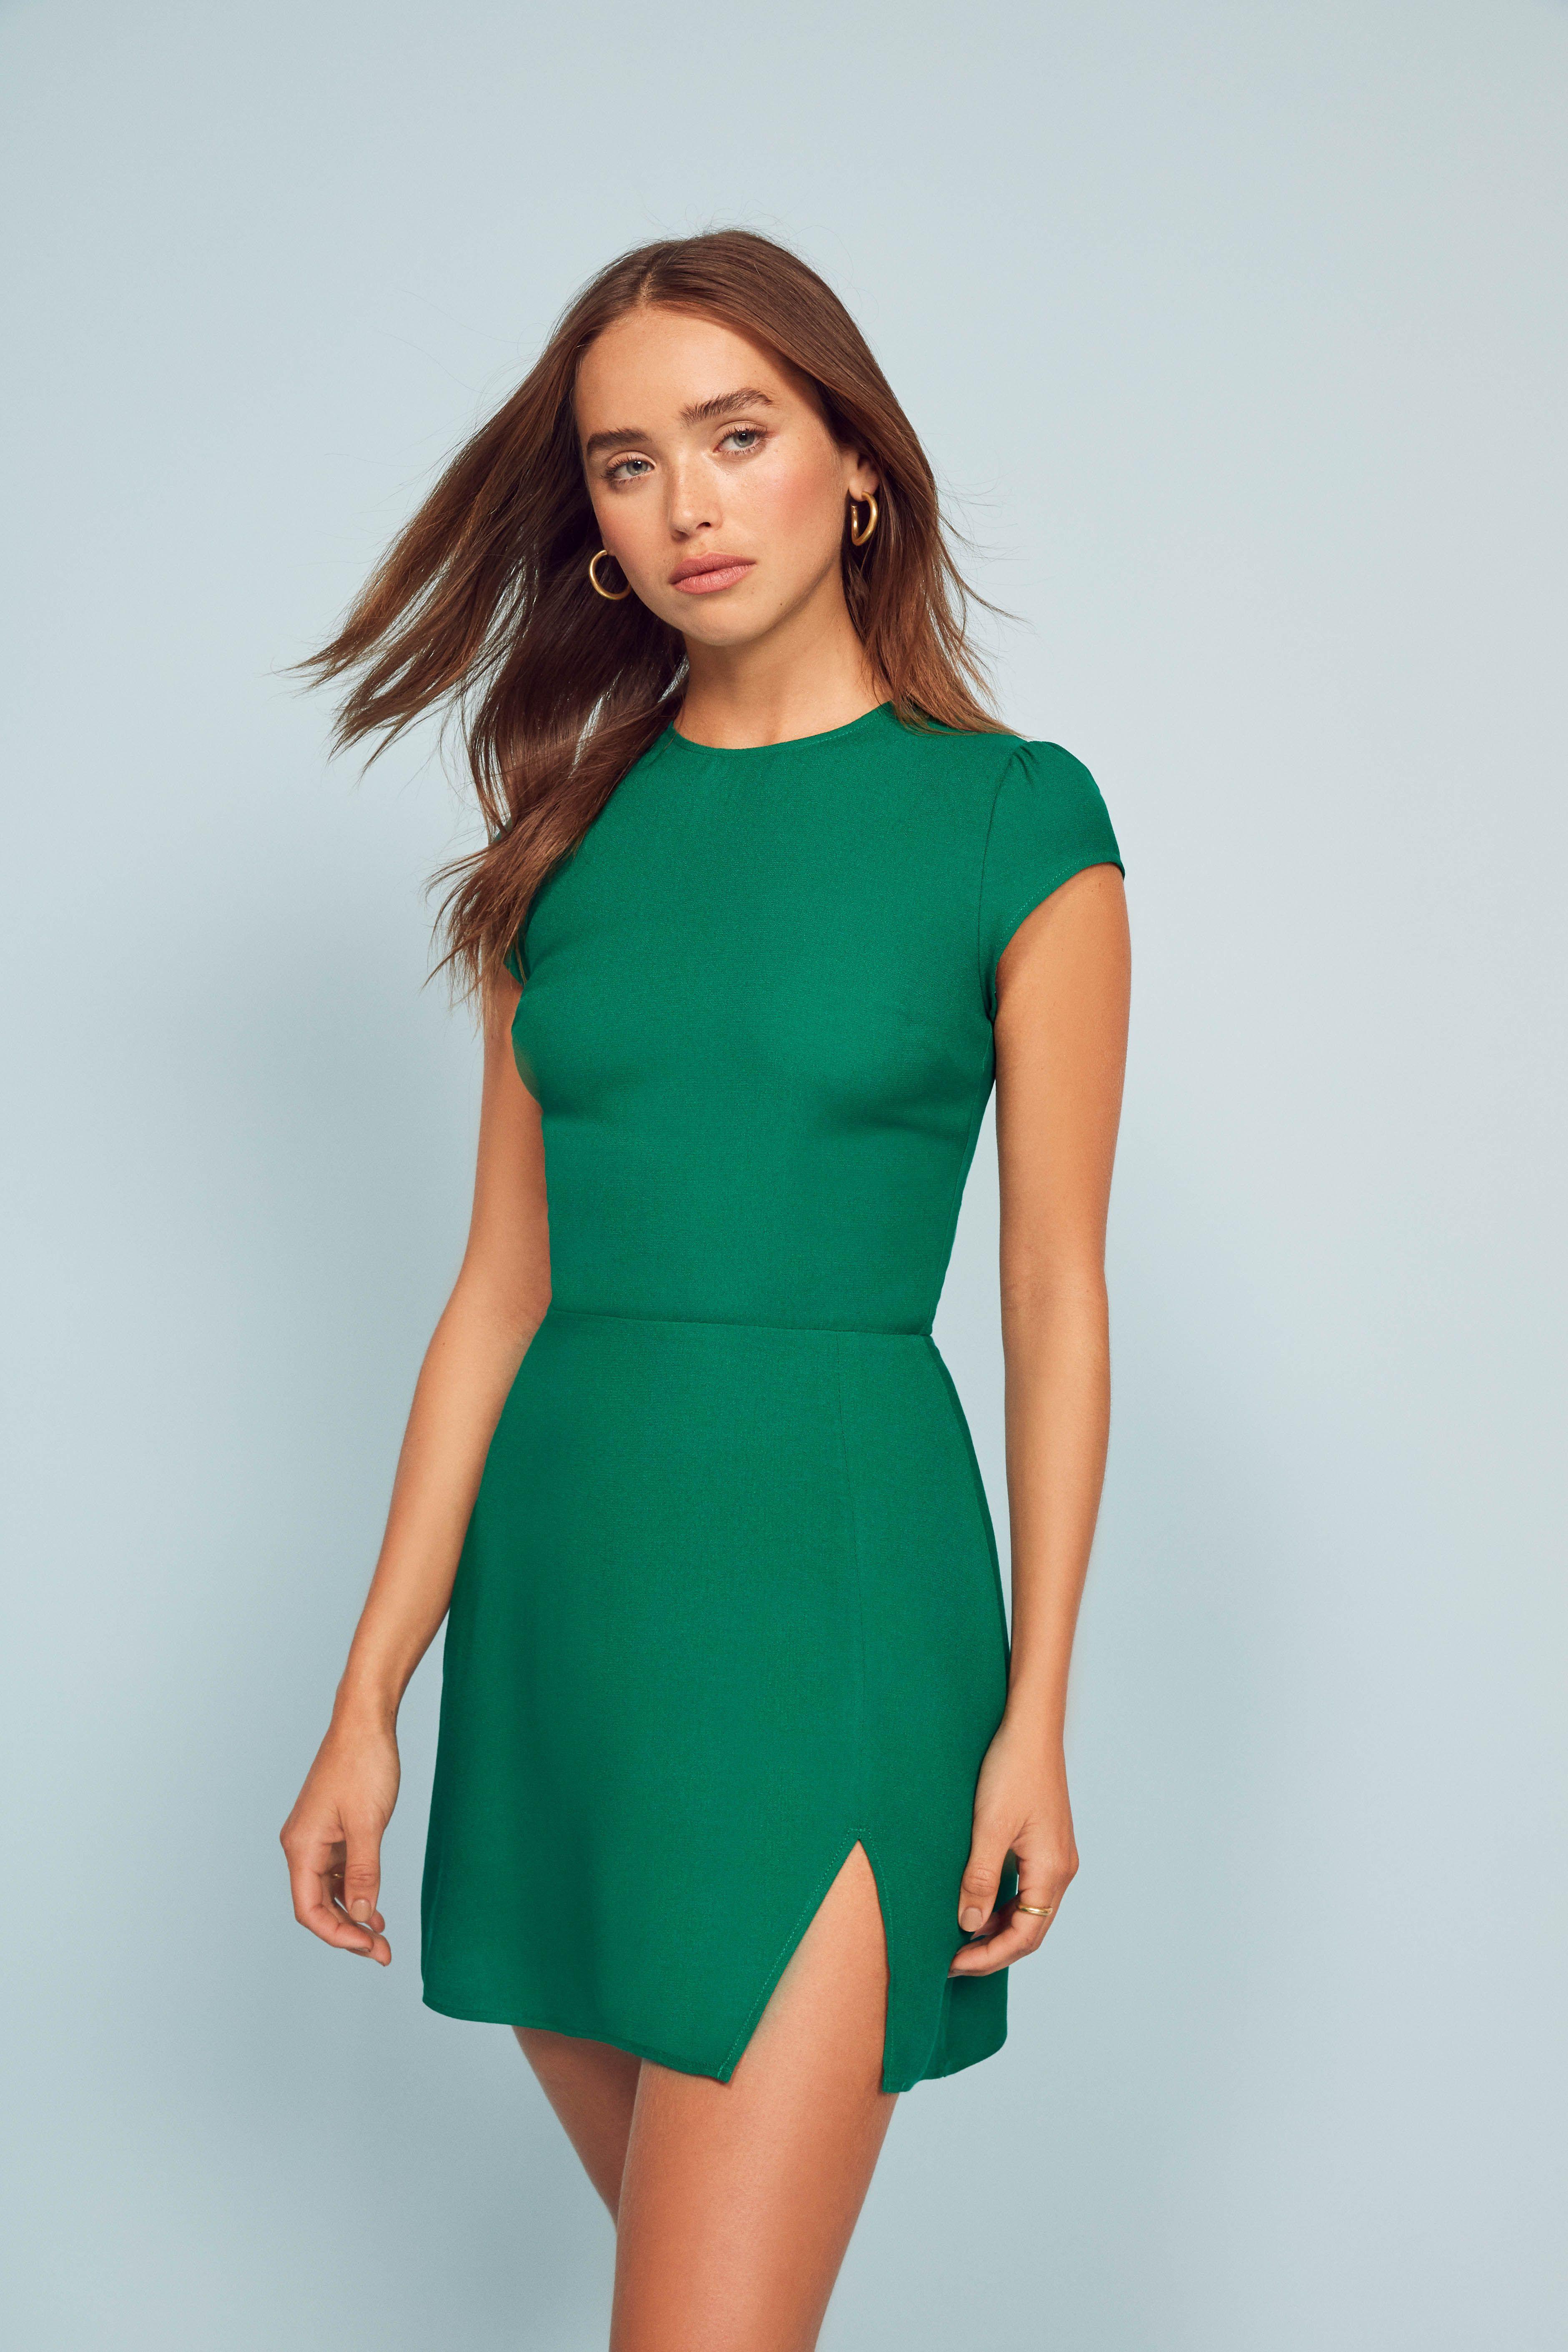 72bbb3905030 Reformation Lena Dress in 2019   Dresses   Fashion, Dresses, Fashion ...